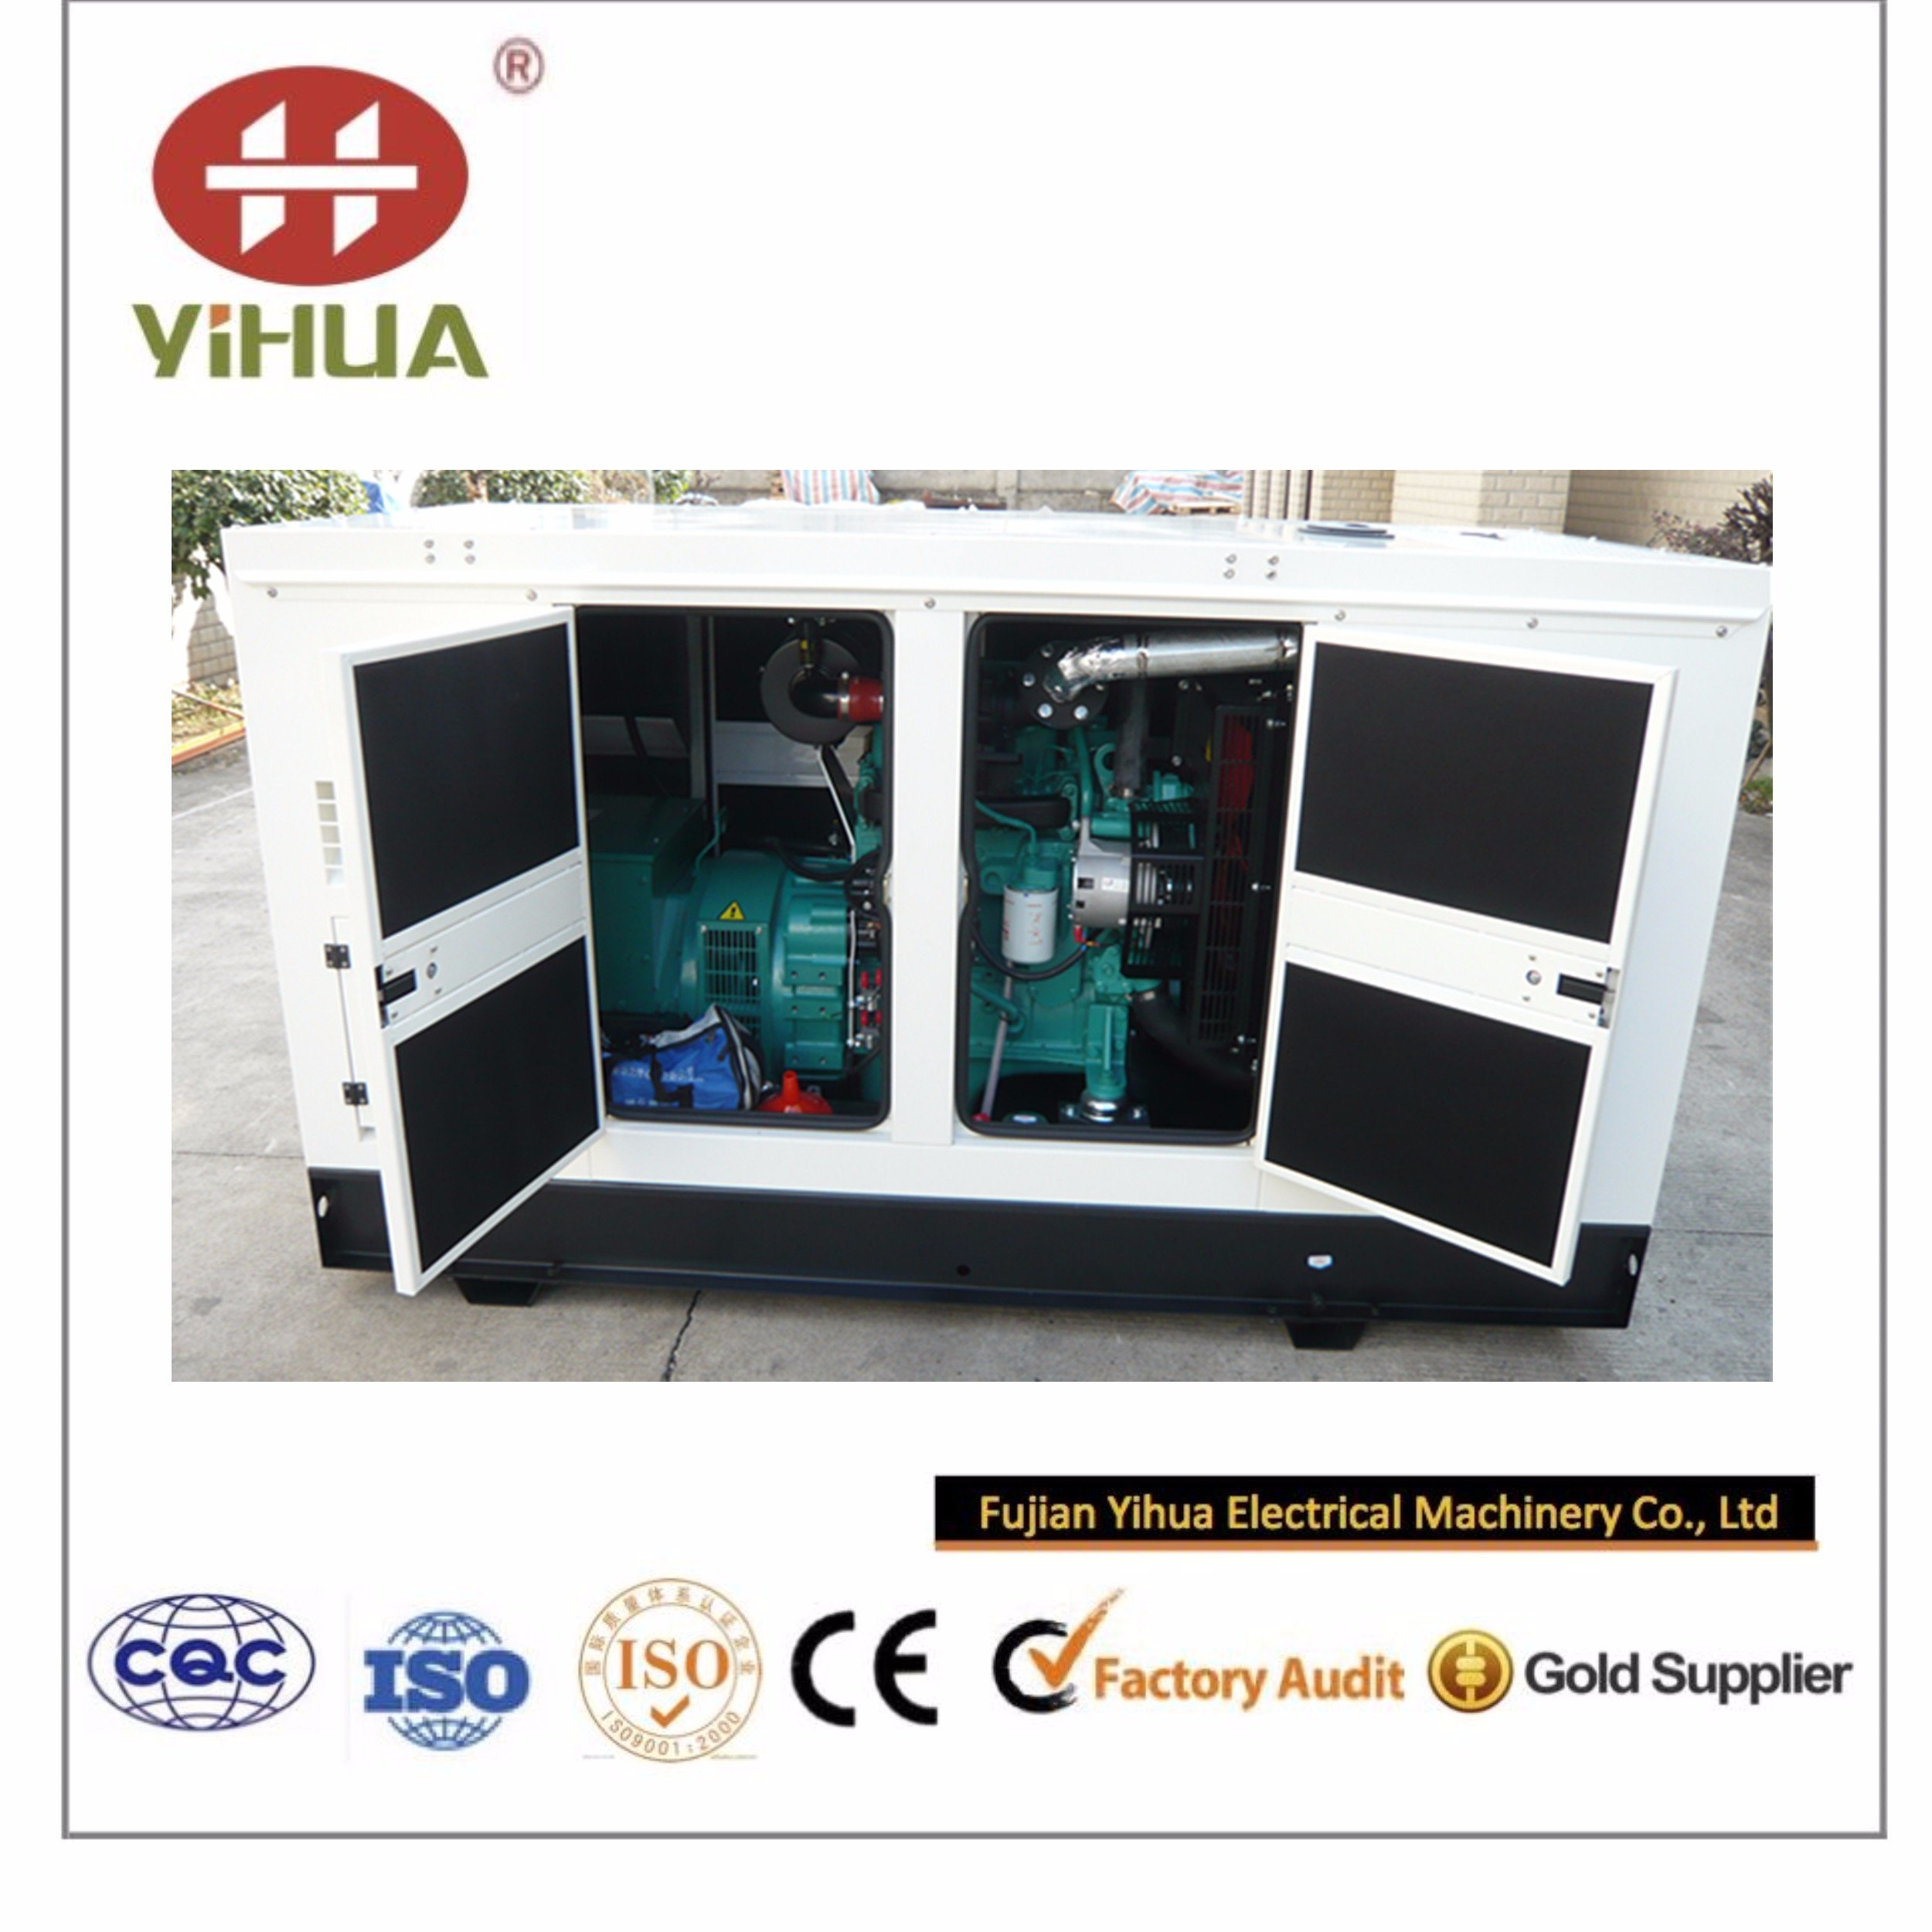 20kVA~250kVA Super Silent Diesel Power Generator with CPT Cummins Engine